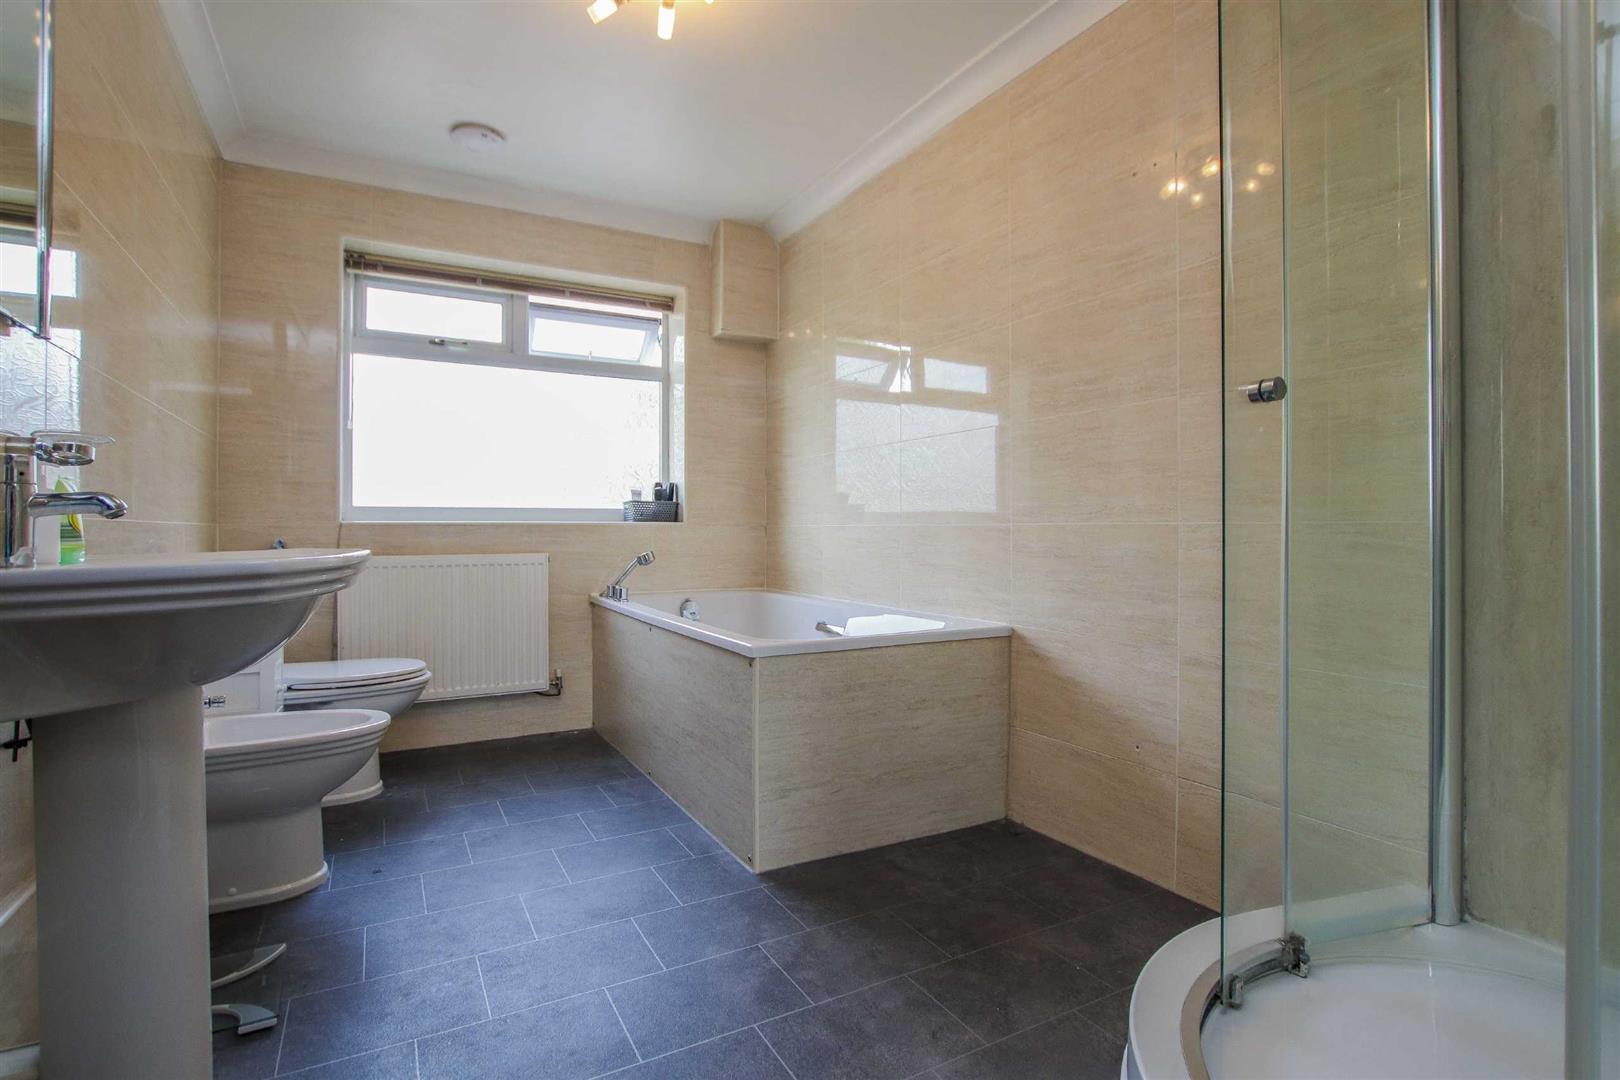 5 Bedroom Detached Bungalow For Sale - Image 20